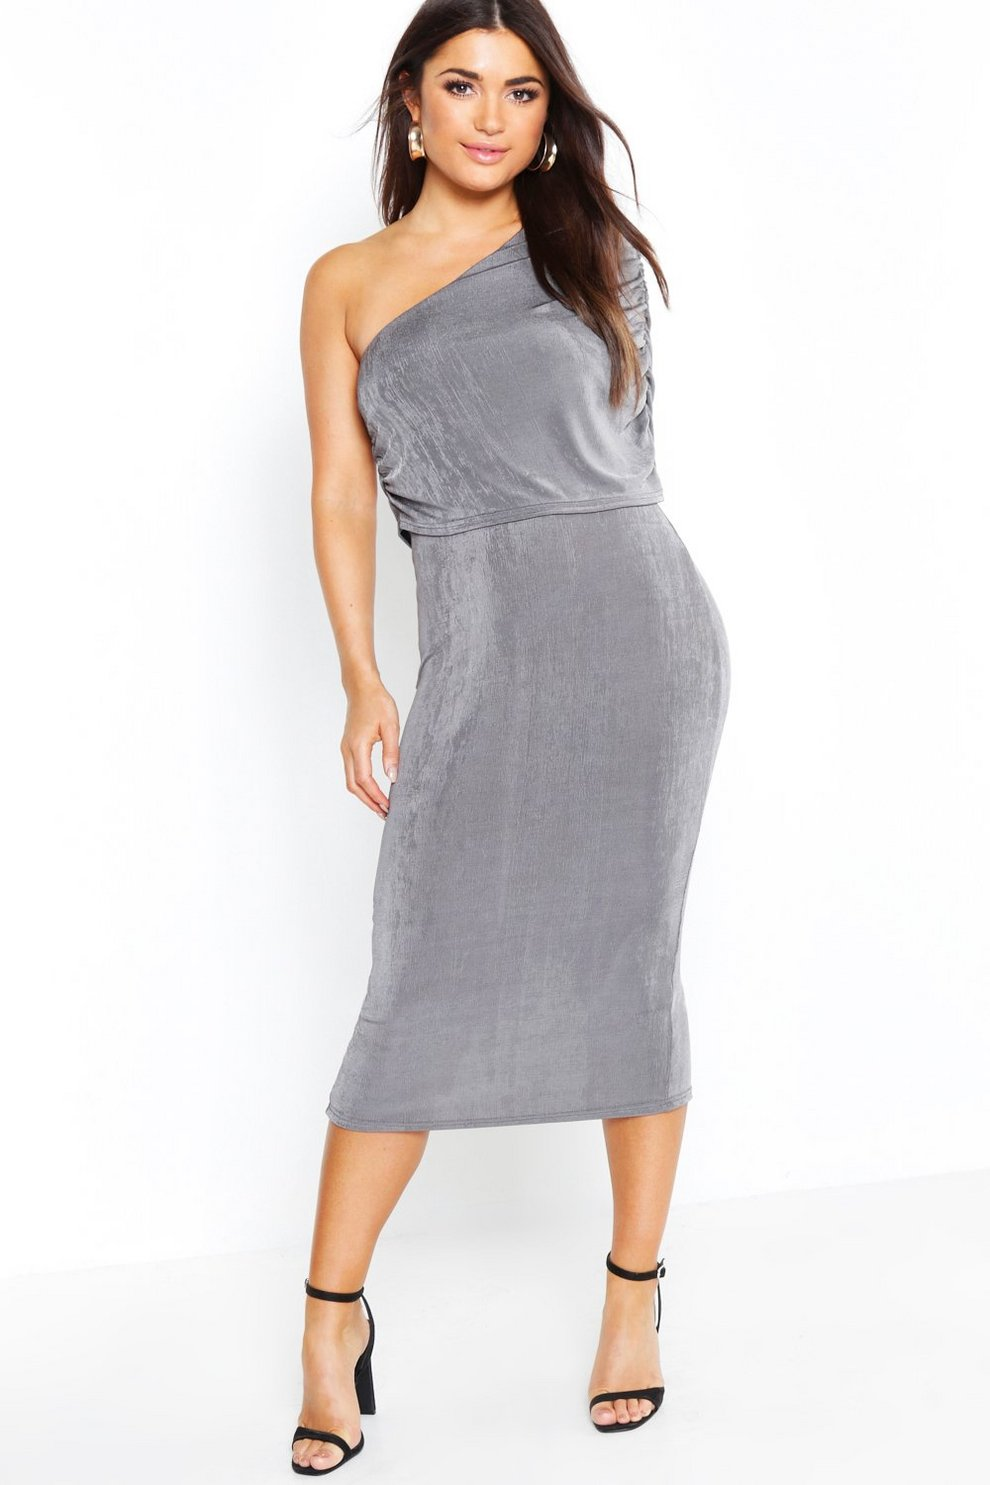 05f2d49440c7 One Shoulder Ruched Detail Slinky Midi Dress | Boohoo